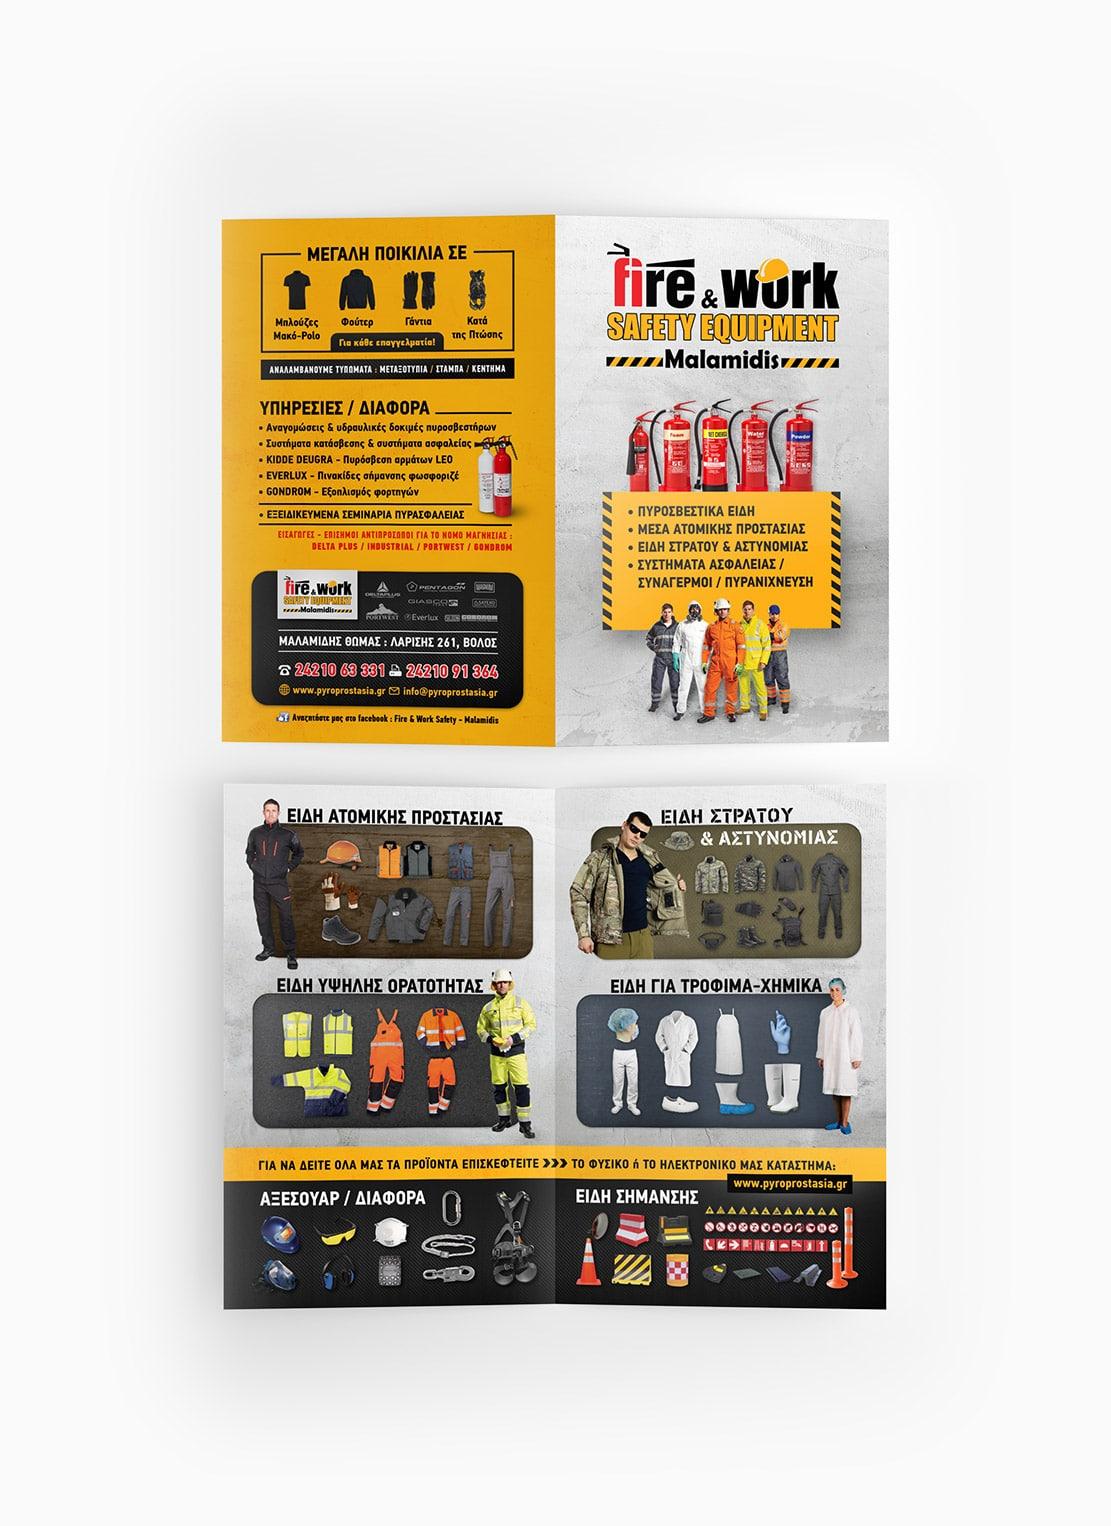 trakaliaroudis brochure fire and work safety malamidis